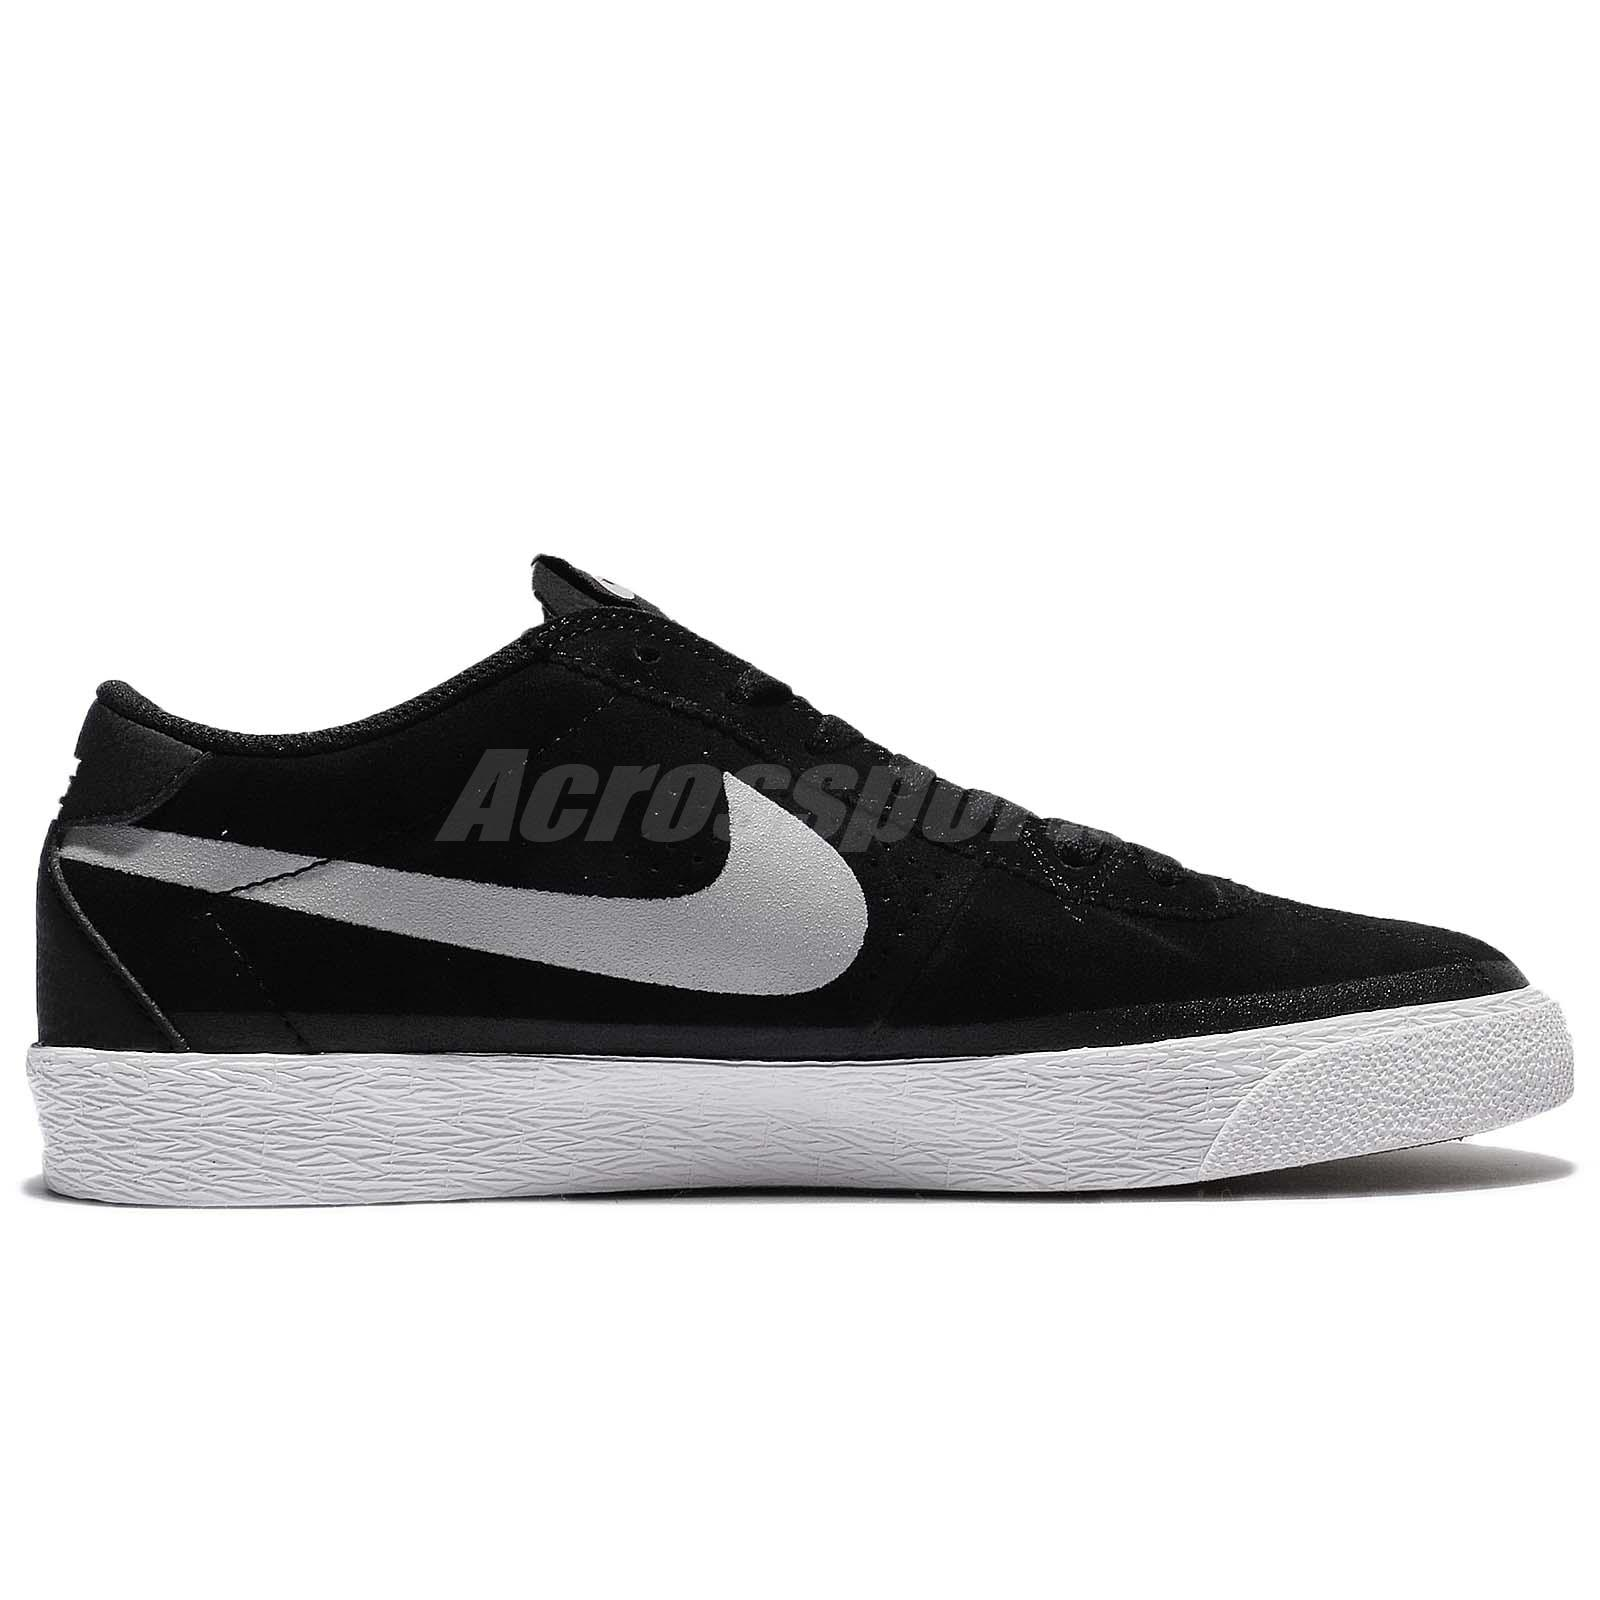 9601587bc6bef белый серый nike bruin fake sneakers b8678 3918c - malaxino.com